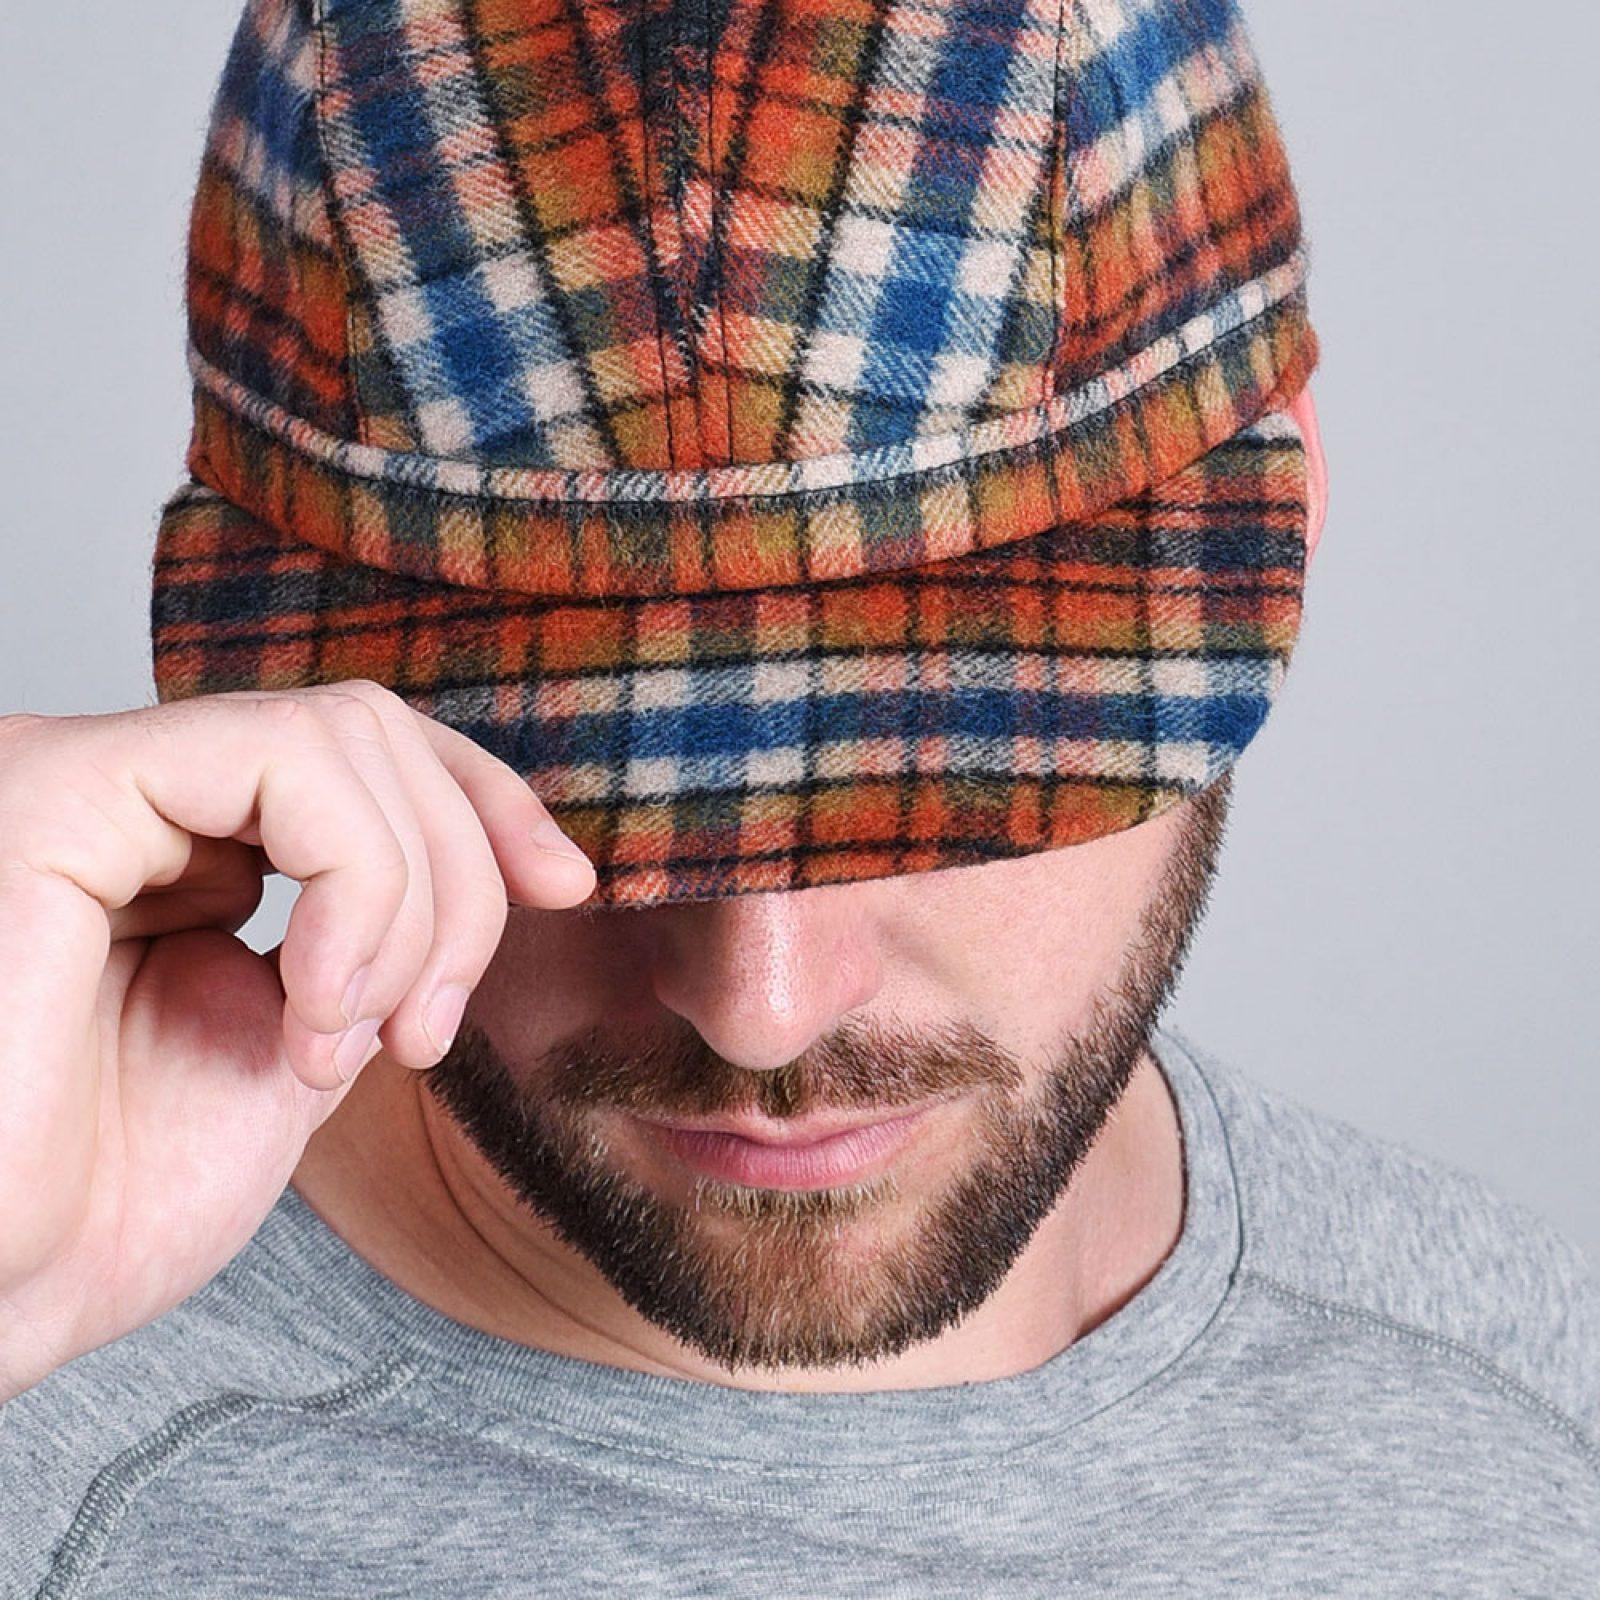 http://lookbook.allee-du-foulard.fr/wp-content/uploads/2018/11/CP-01008-VH10-3-casquette-laine-orange-1600x1600.jpg